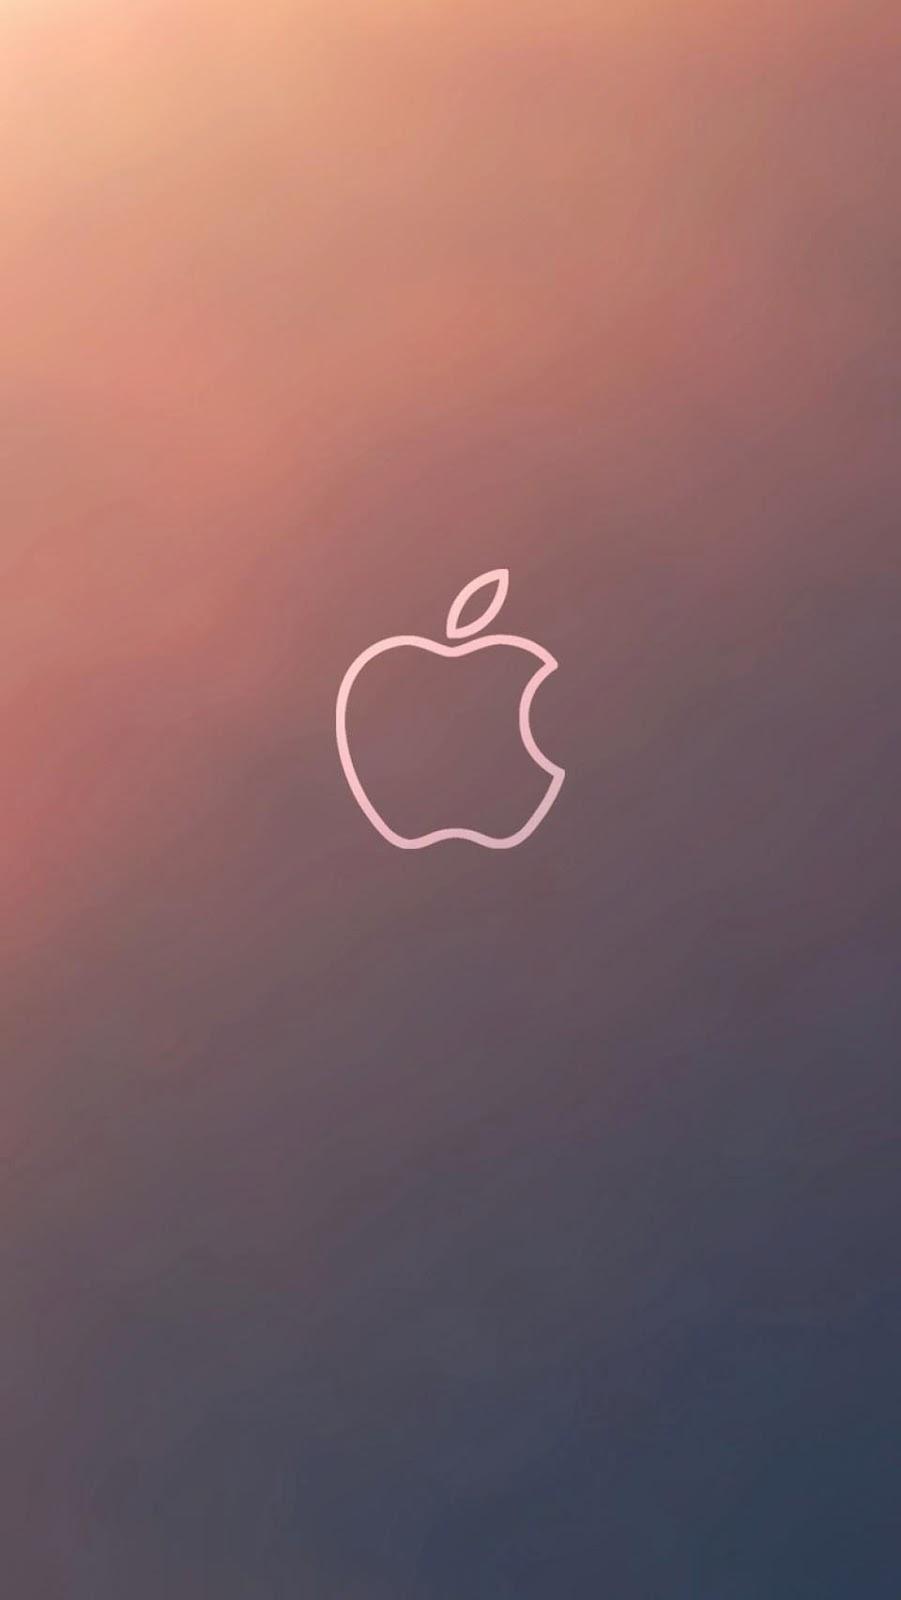 iPhone 6 6 Plus Wallpaper   Apple Logo   Covers Heat 901x1600